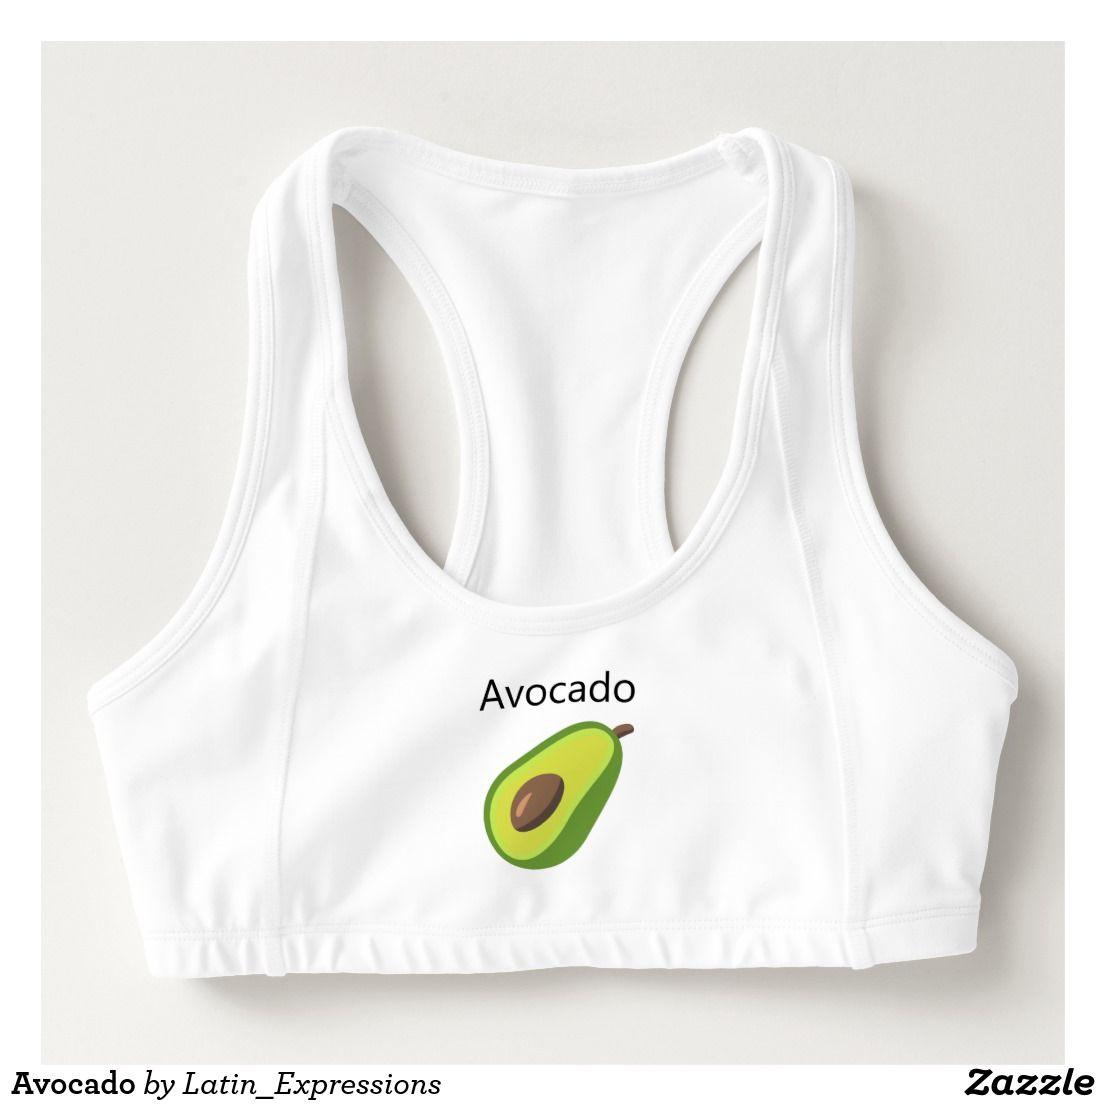 5fe2b9a756 Avocado Sports Bra by Latin Expressions on Zazzle